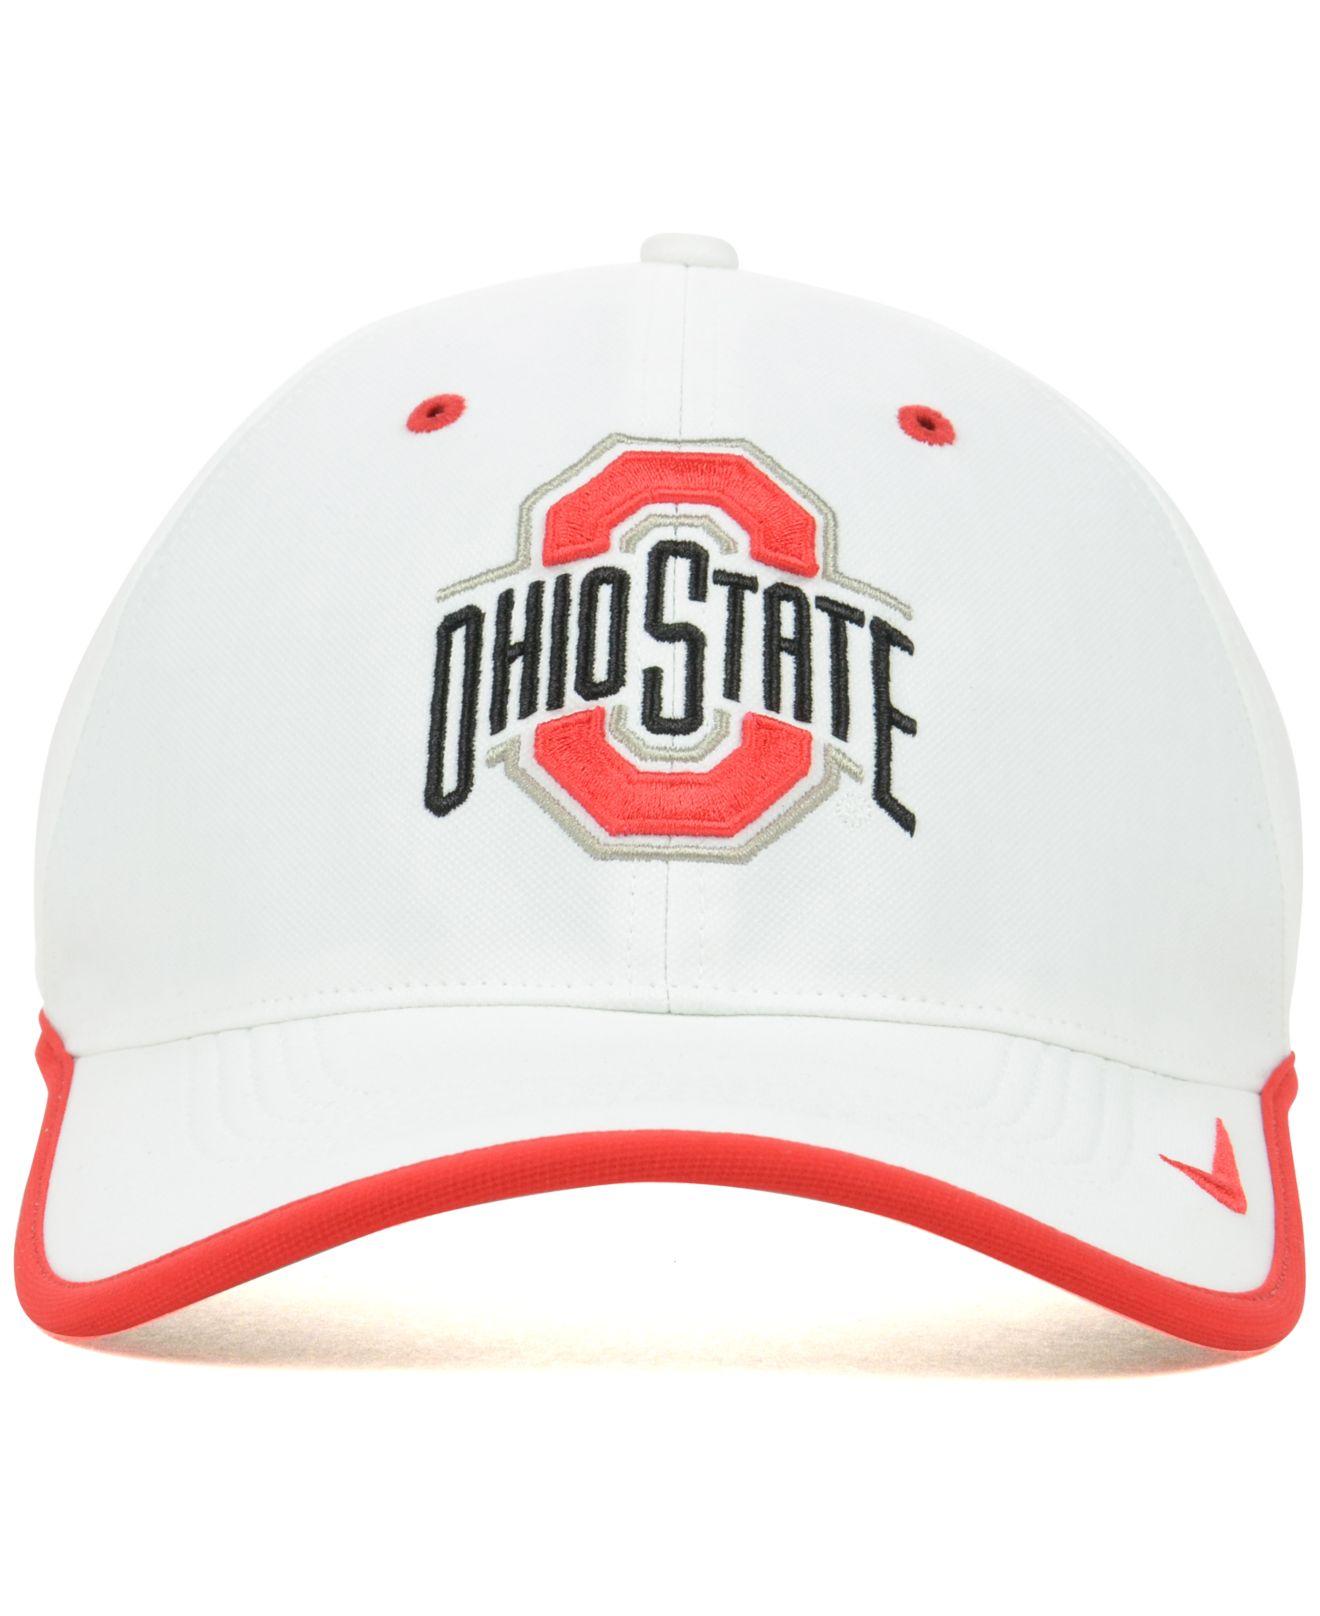 free shipping e6fda 06b4b ... 50% off lyst nike ohio state buckeyes coaches dri fit cap in orange for  men